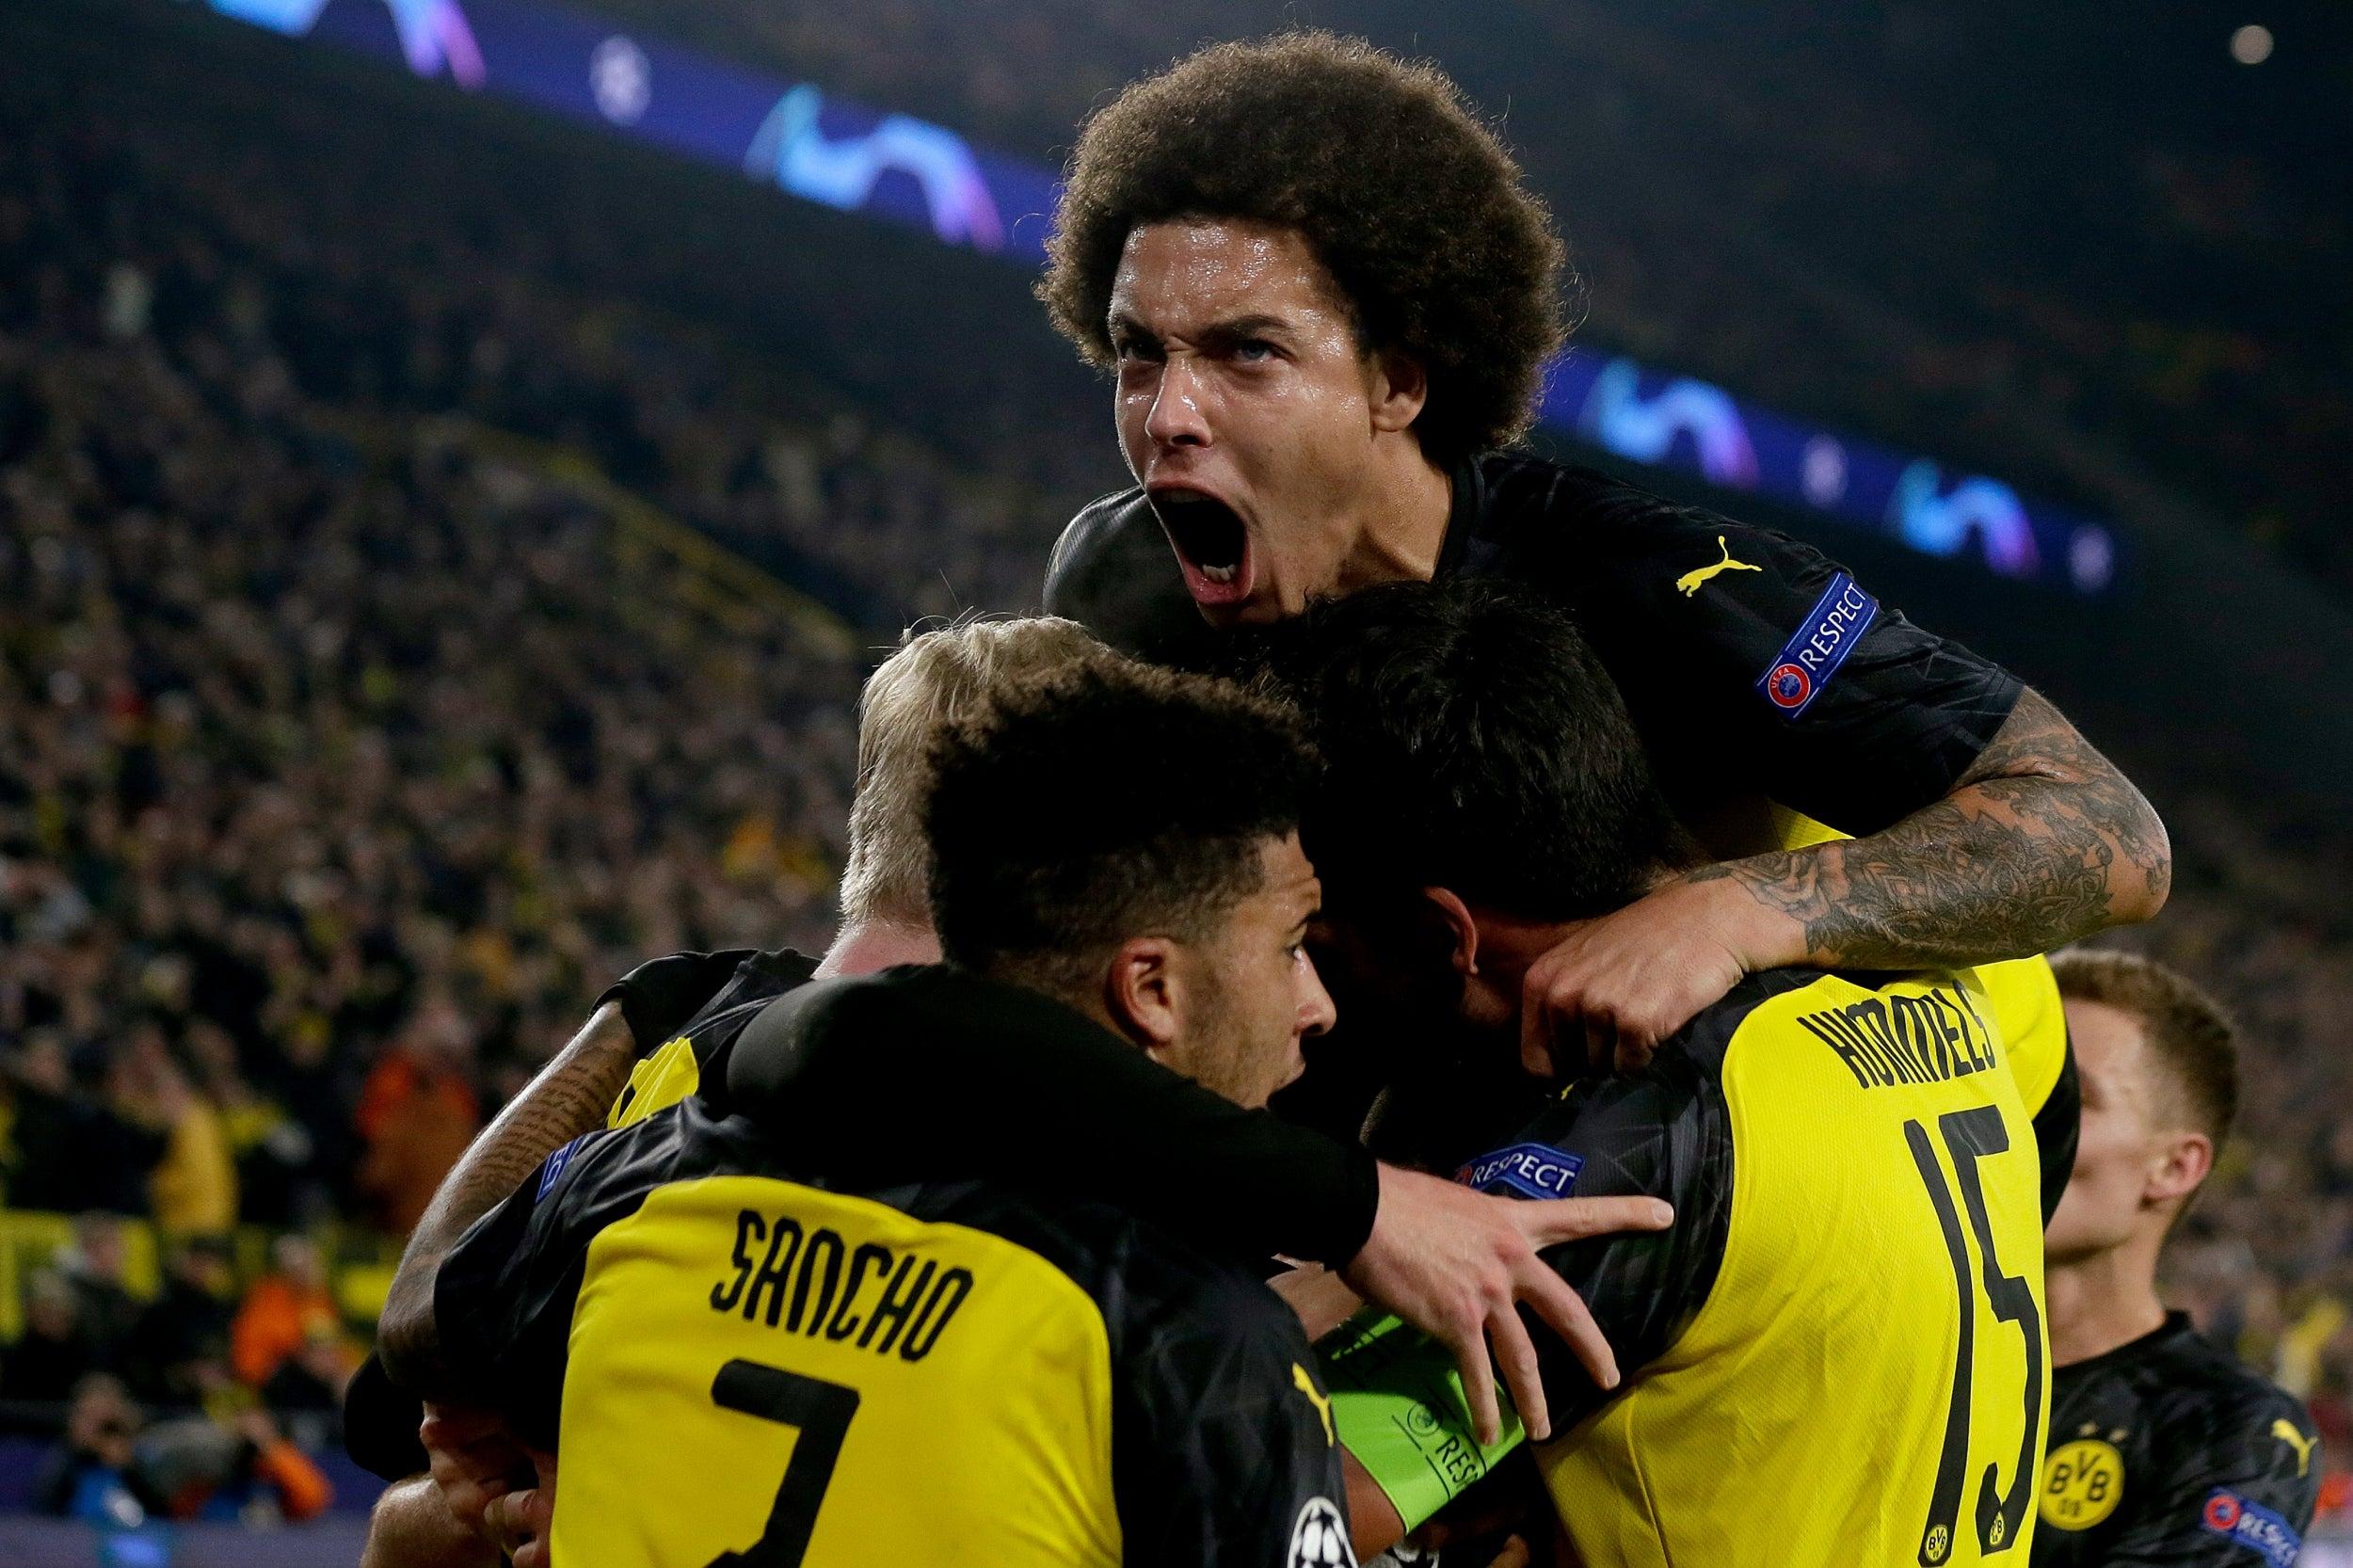 Borussia Dortmund vs Bayern Munich team news: Mats Hummels and Axel Witsel to make returns